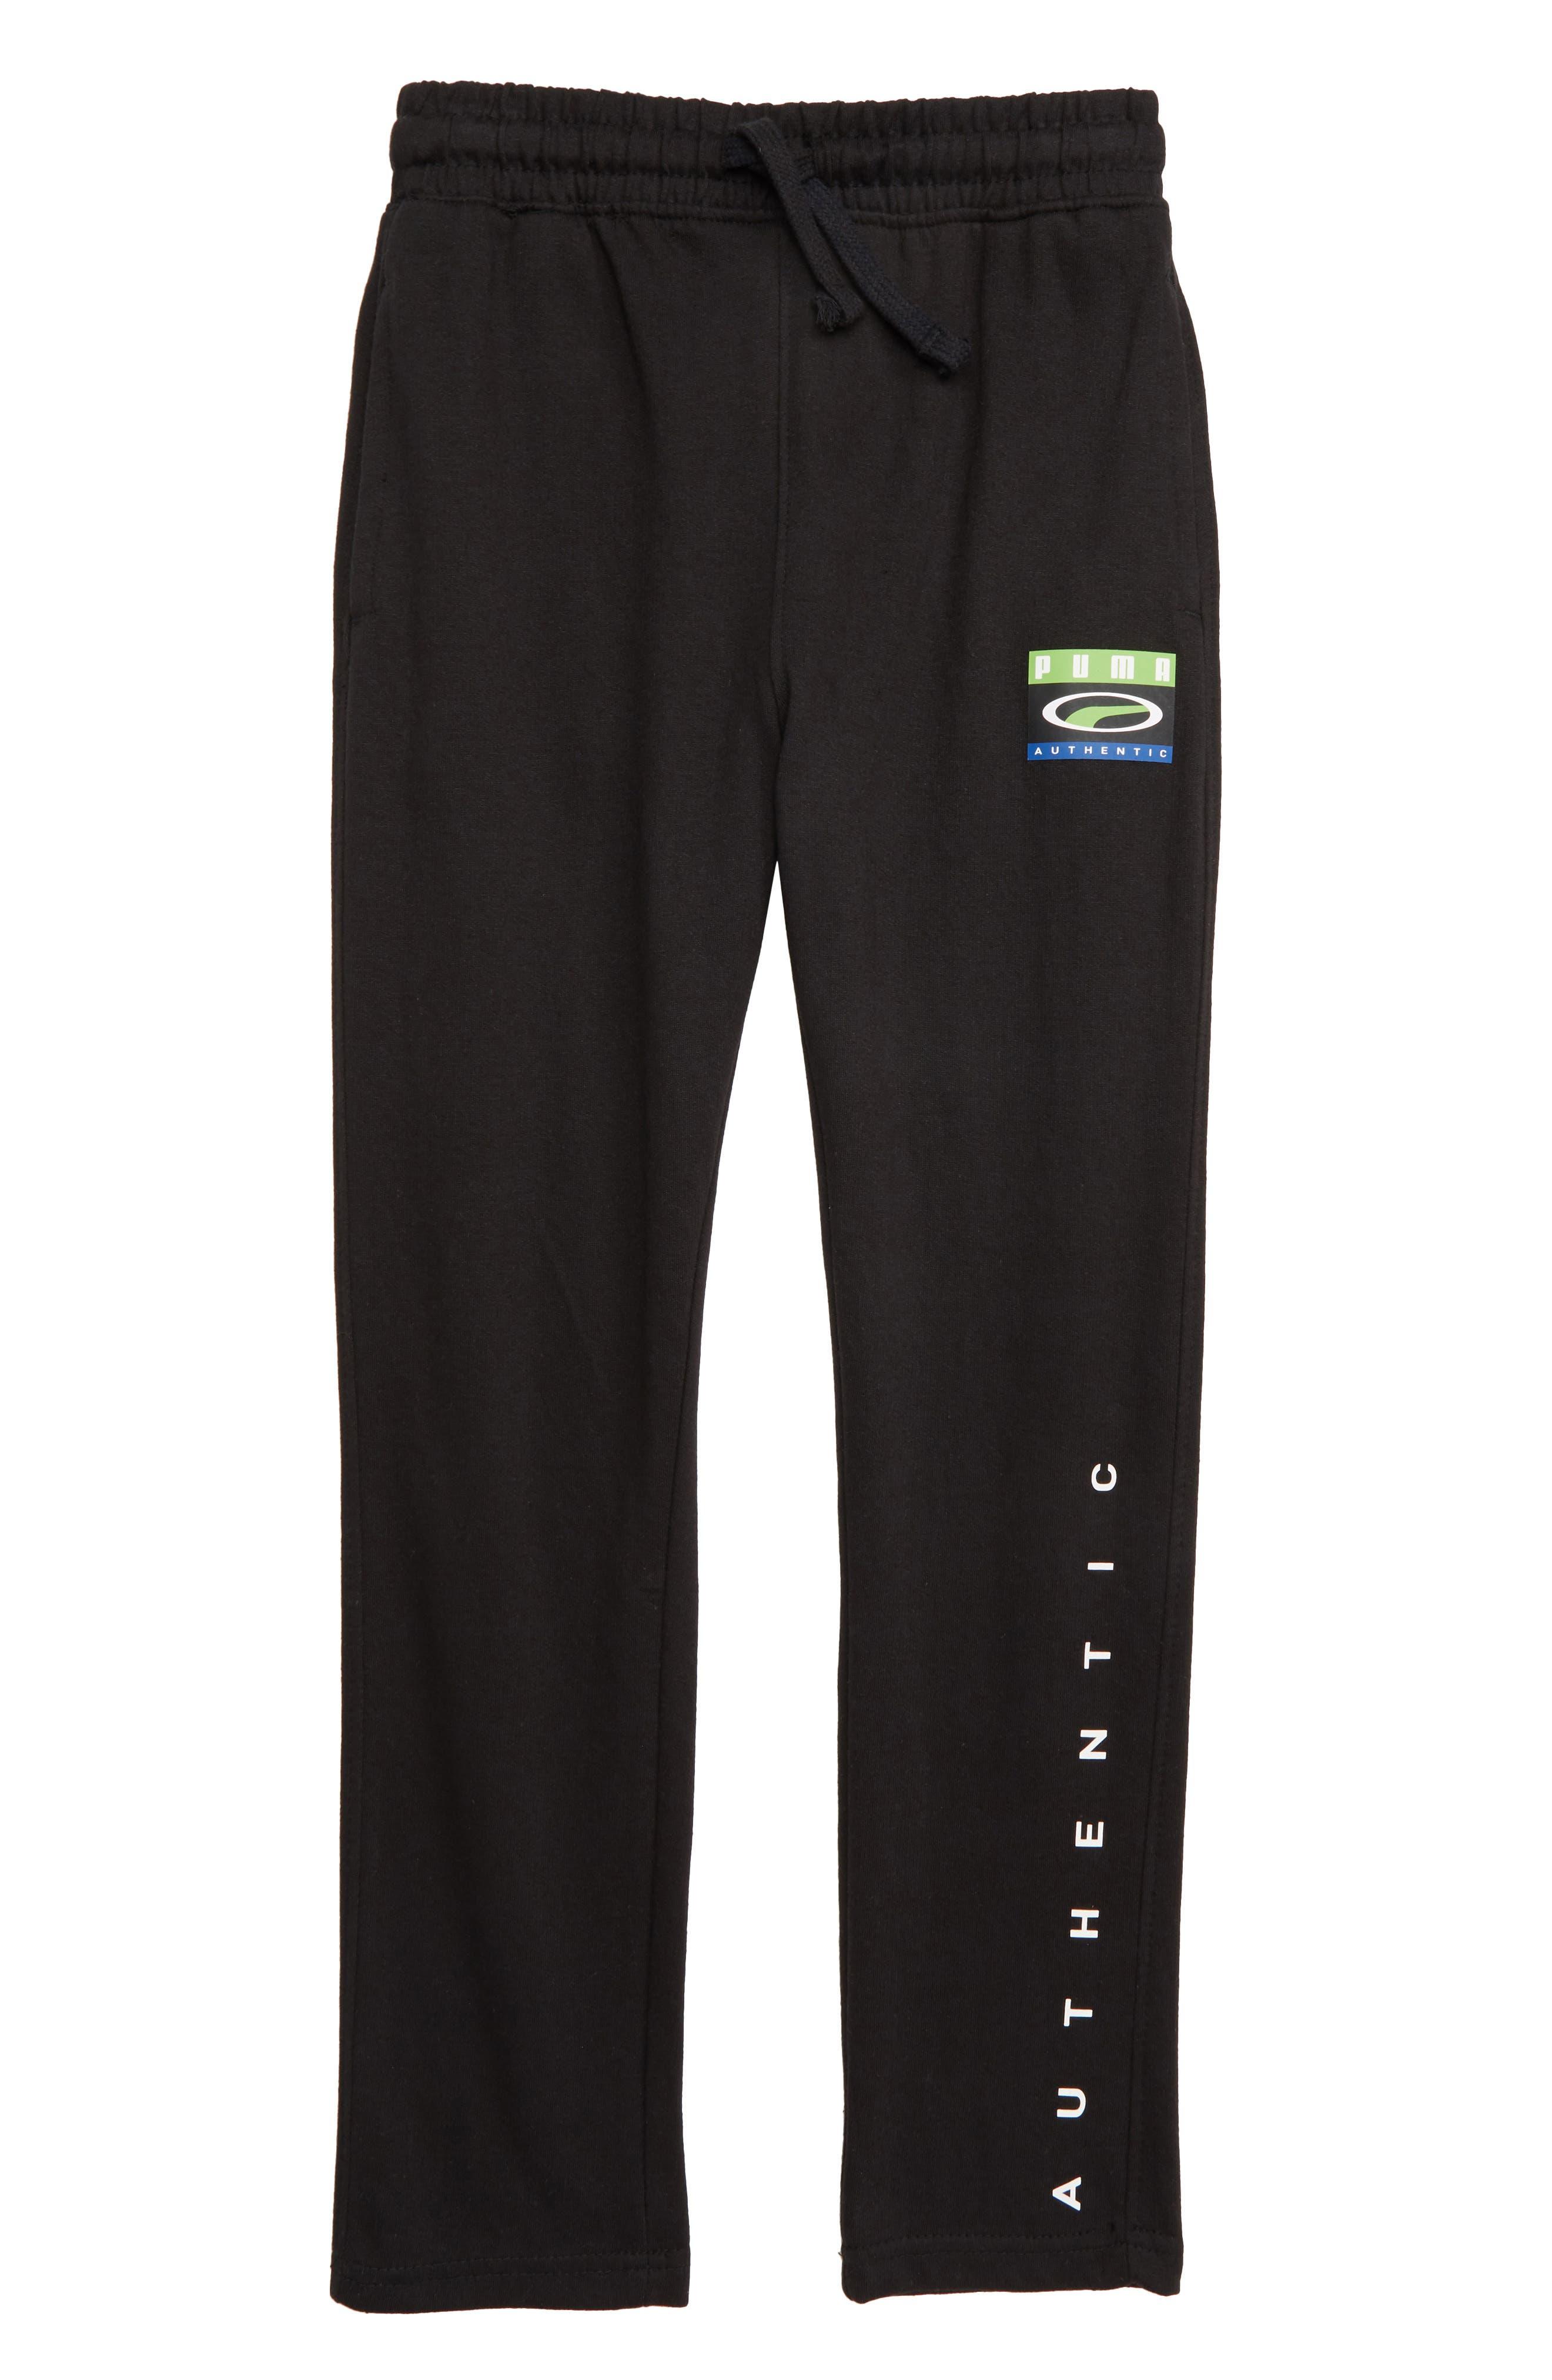 PUMA Cotton Fleece Tapered Pants, Main, color, PUMA BLACK